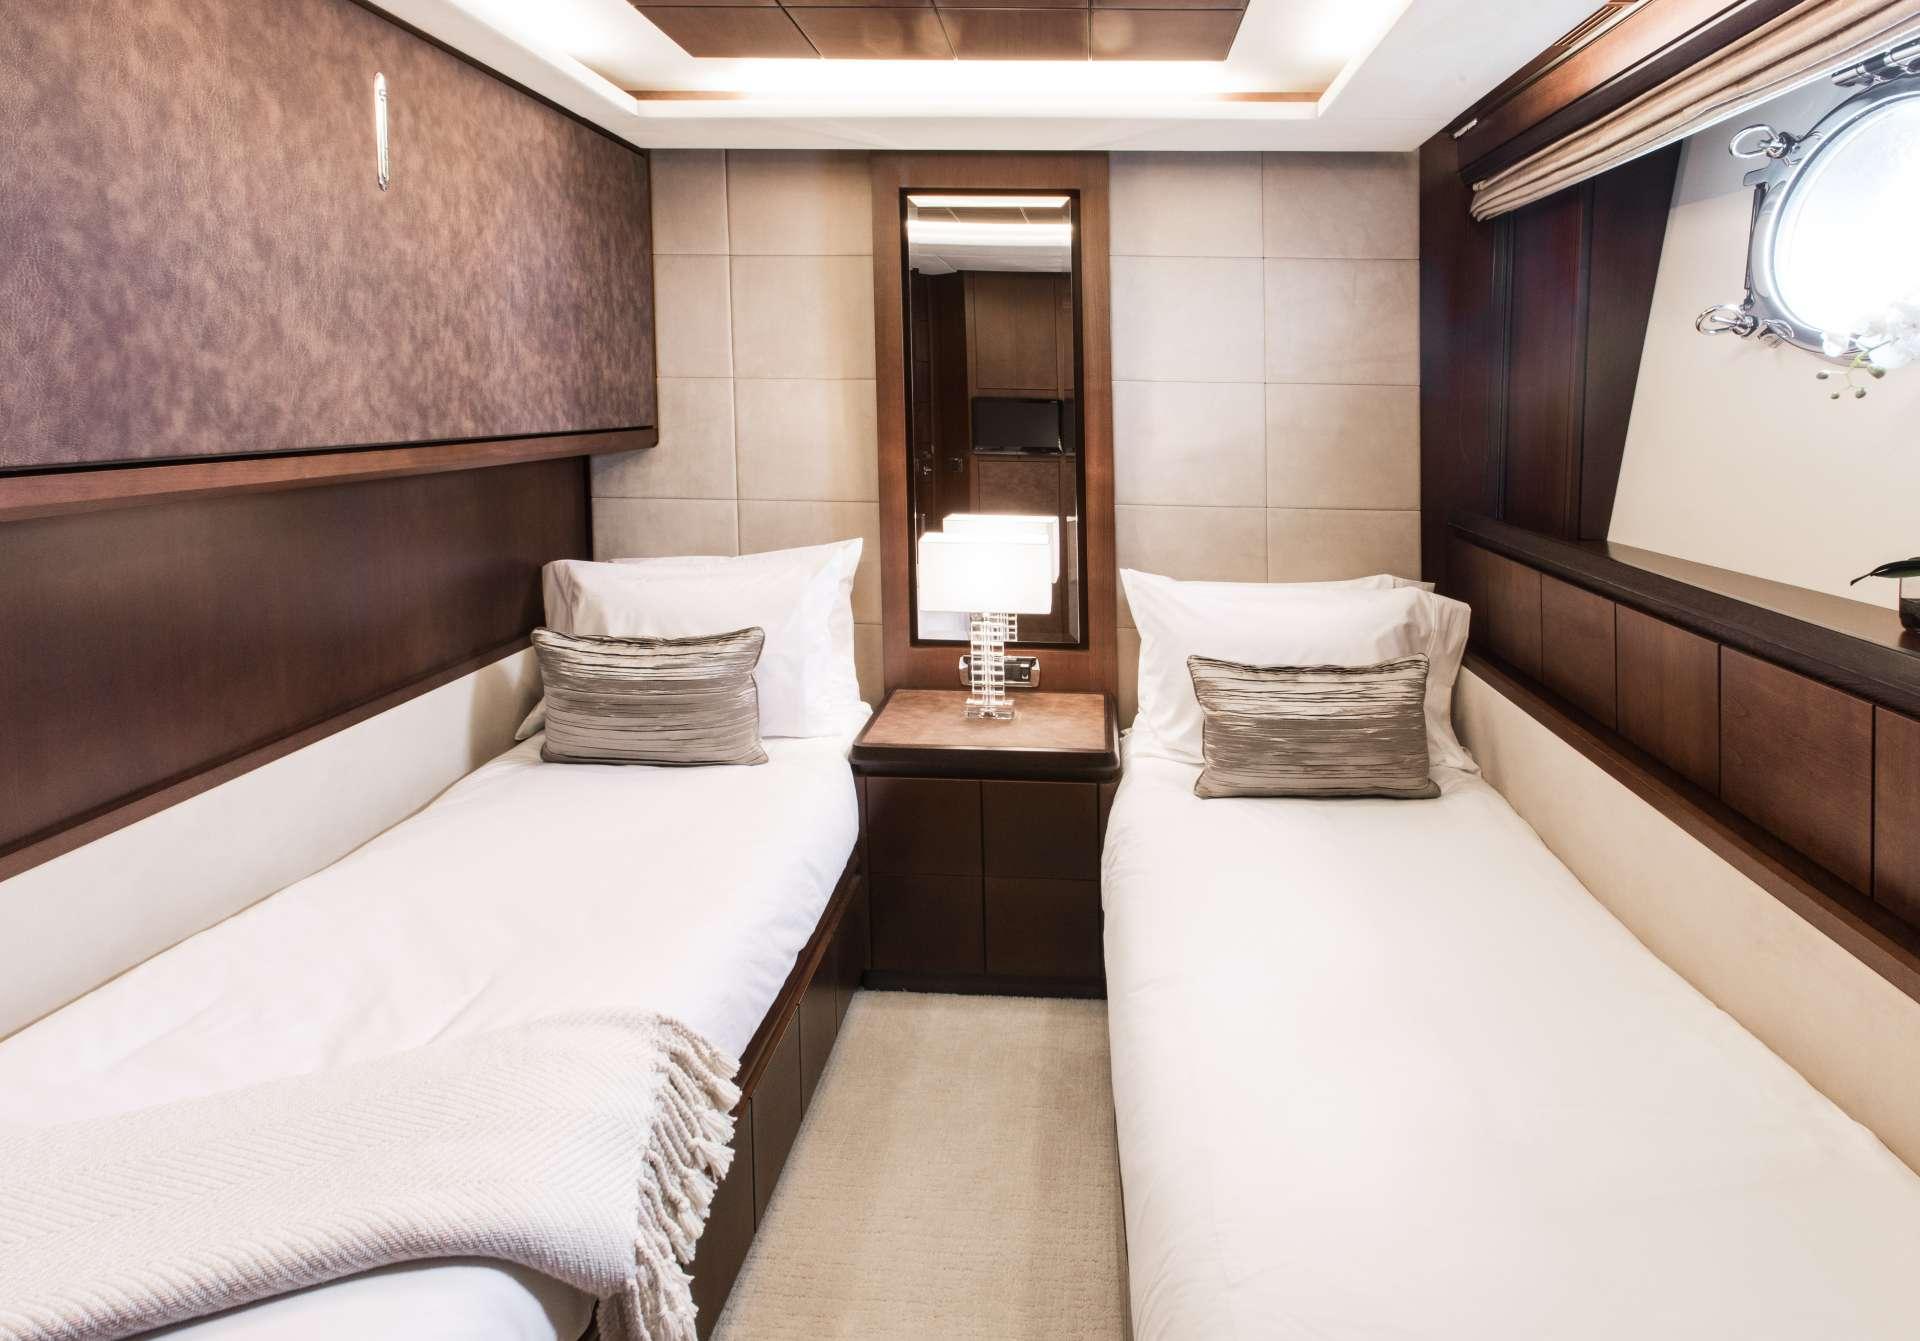 Motor Yacht 'TAIL LIGHTS' Twin Guest Suite, 12 PAX, 6 Crew, 116.00 Ft, 35.00 Meters, Built 2011, Azimut, Refit Year 2016